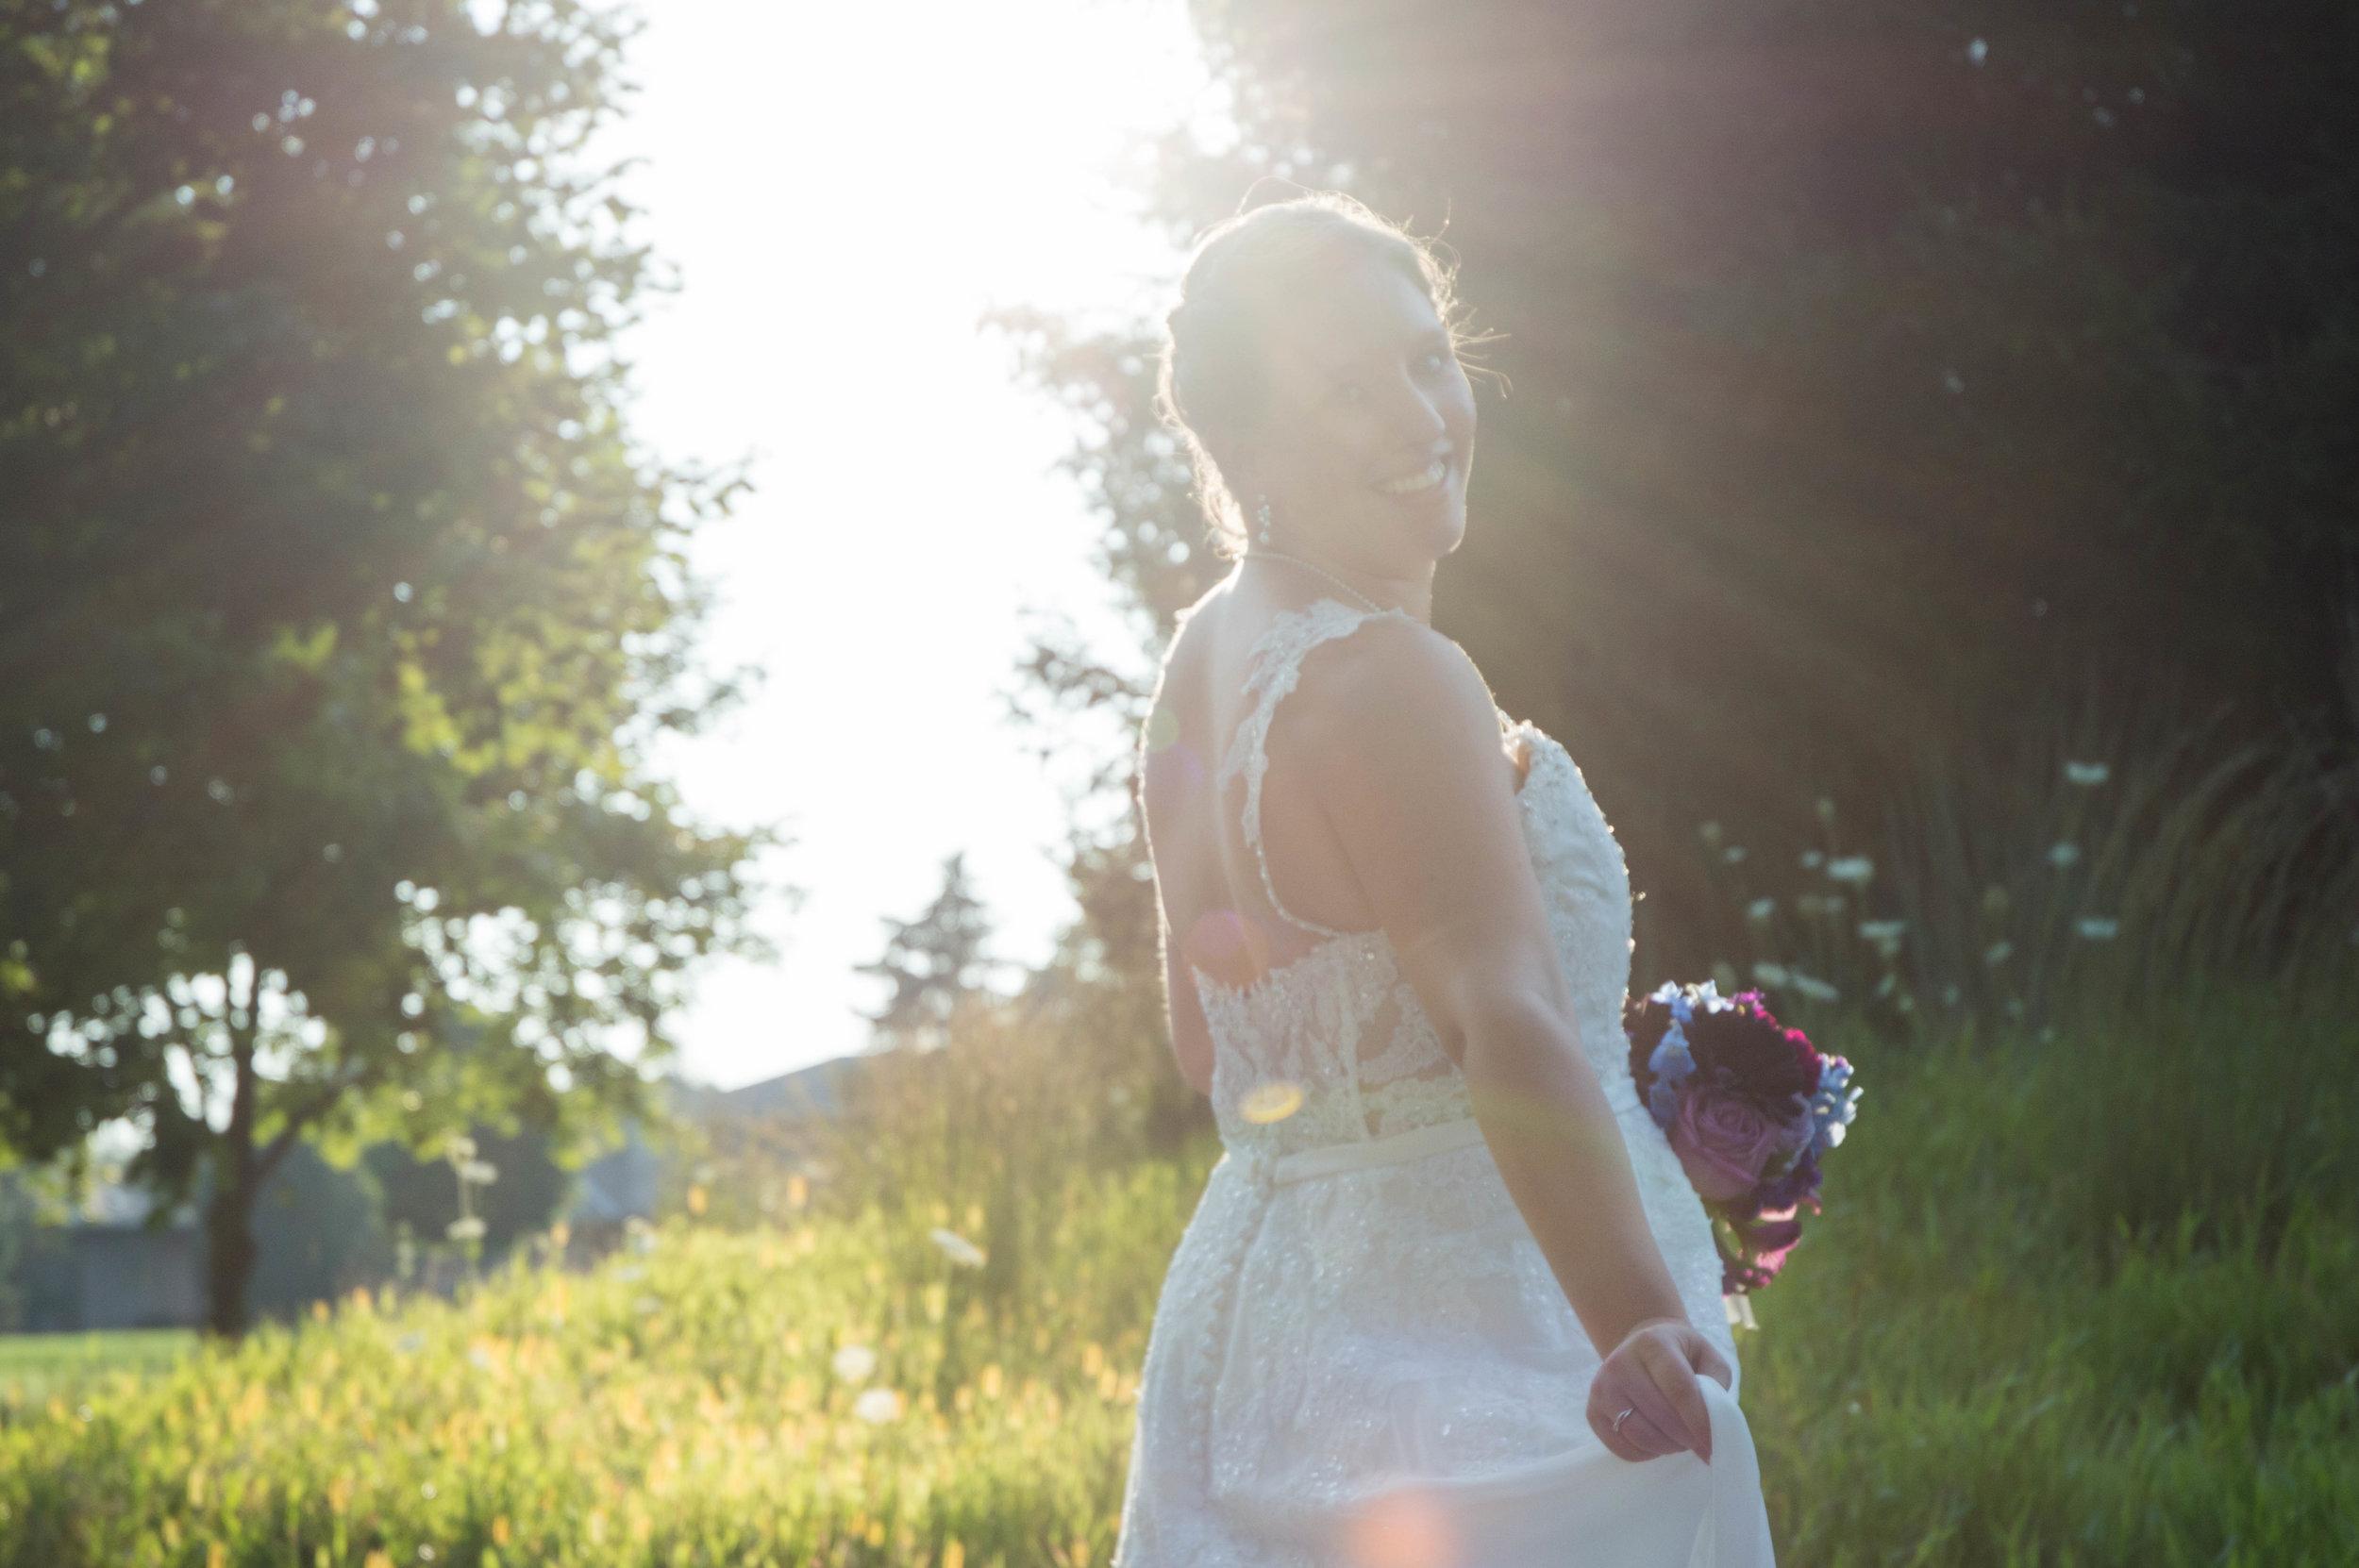 Sunset Wedding Pictures, The Legends in Hartland, Wisconsin Bride